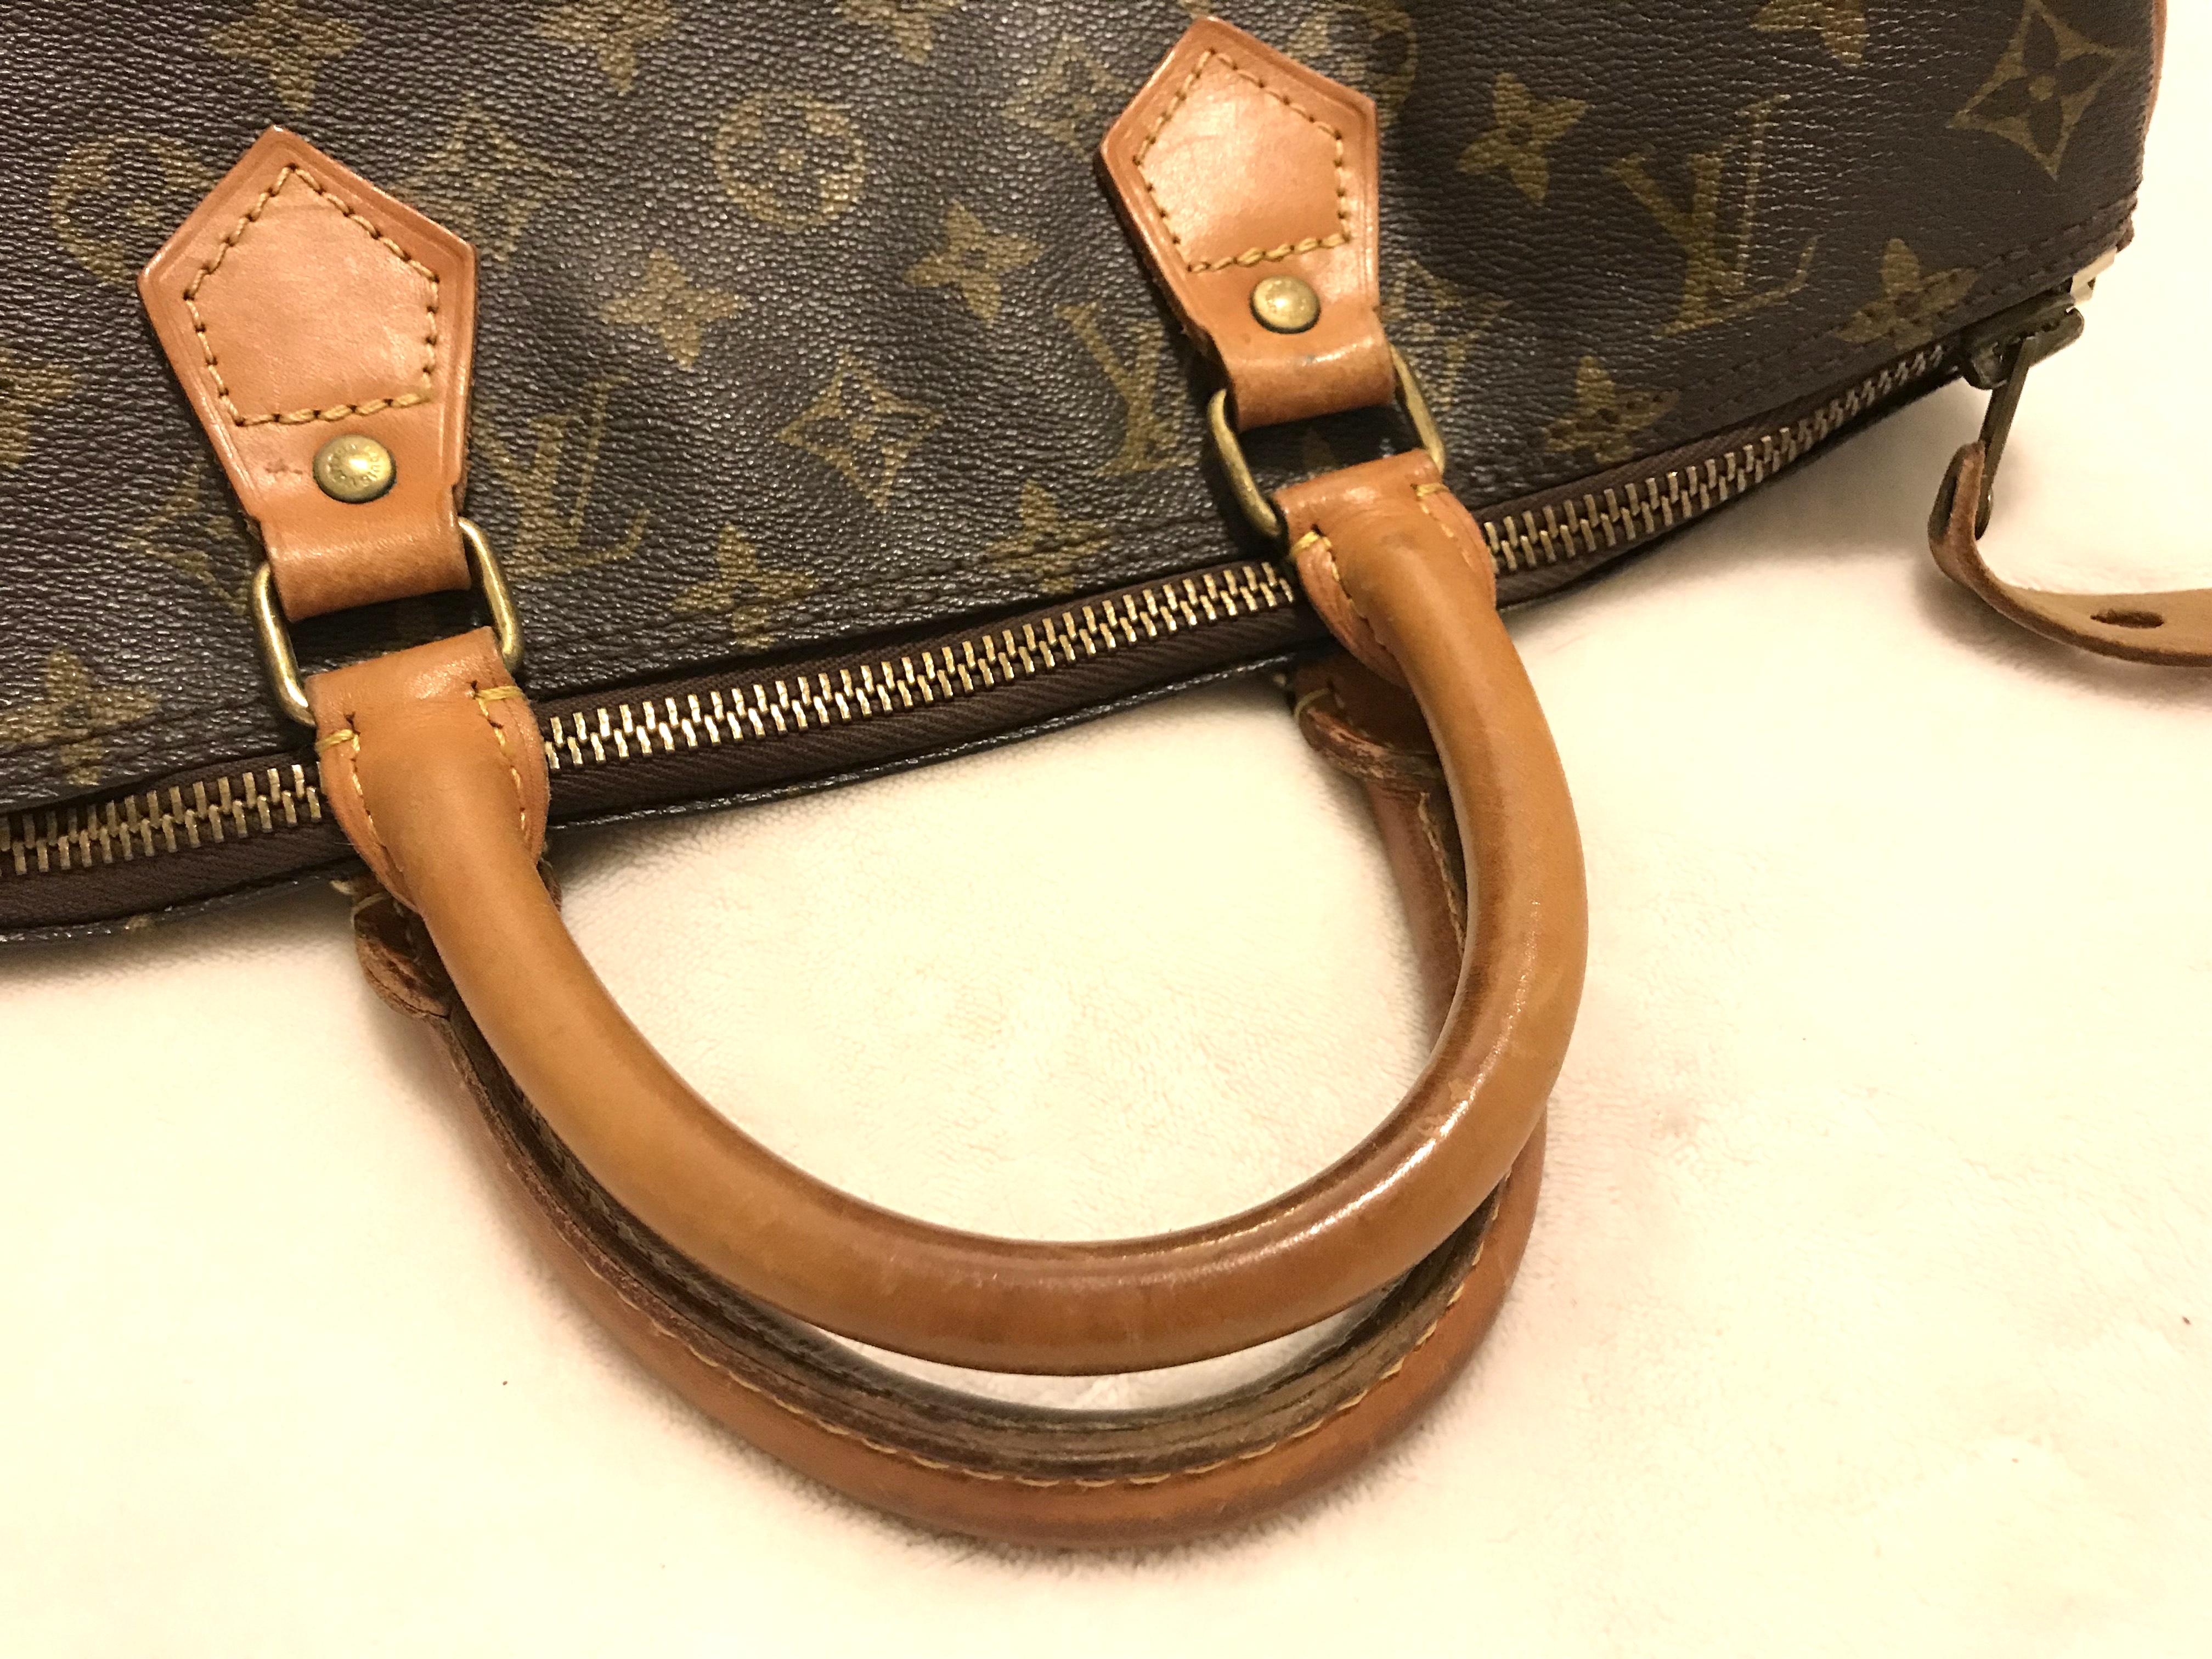 d230d8cc5532 Louis Vuitton Monogram Speedy 35 Handbag - Luxurylana Boutique